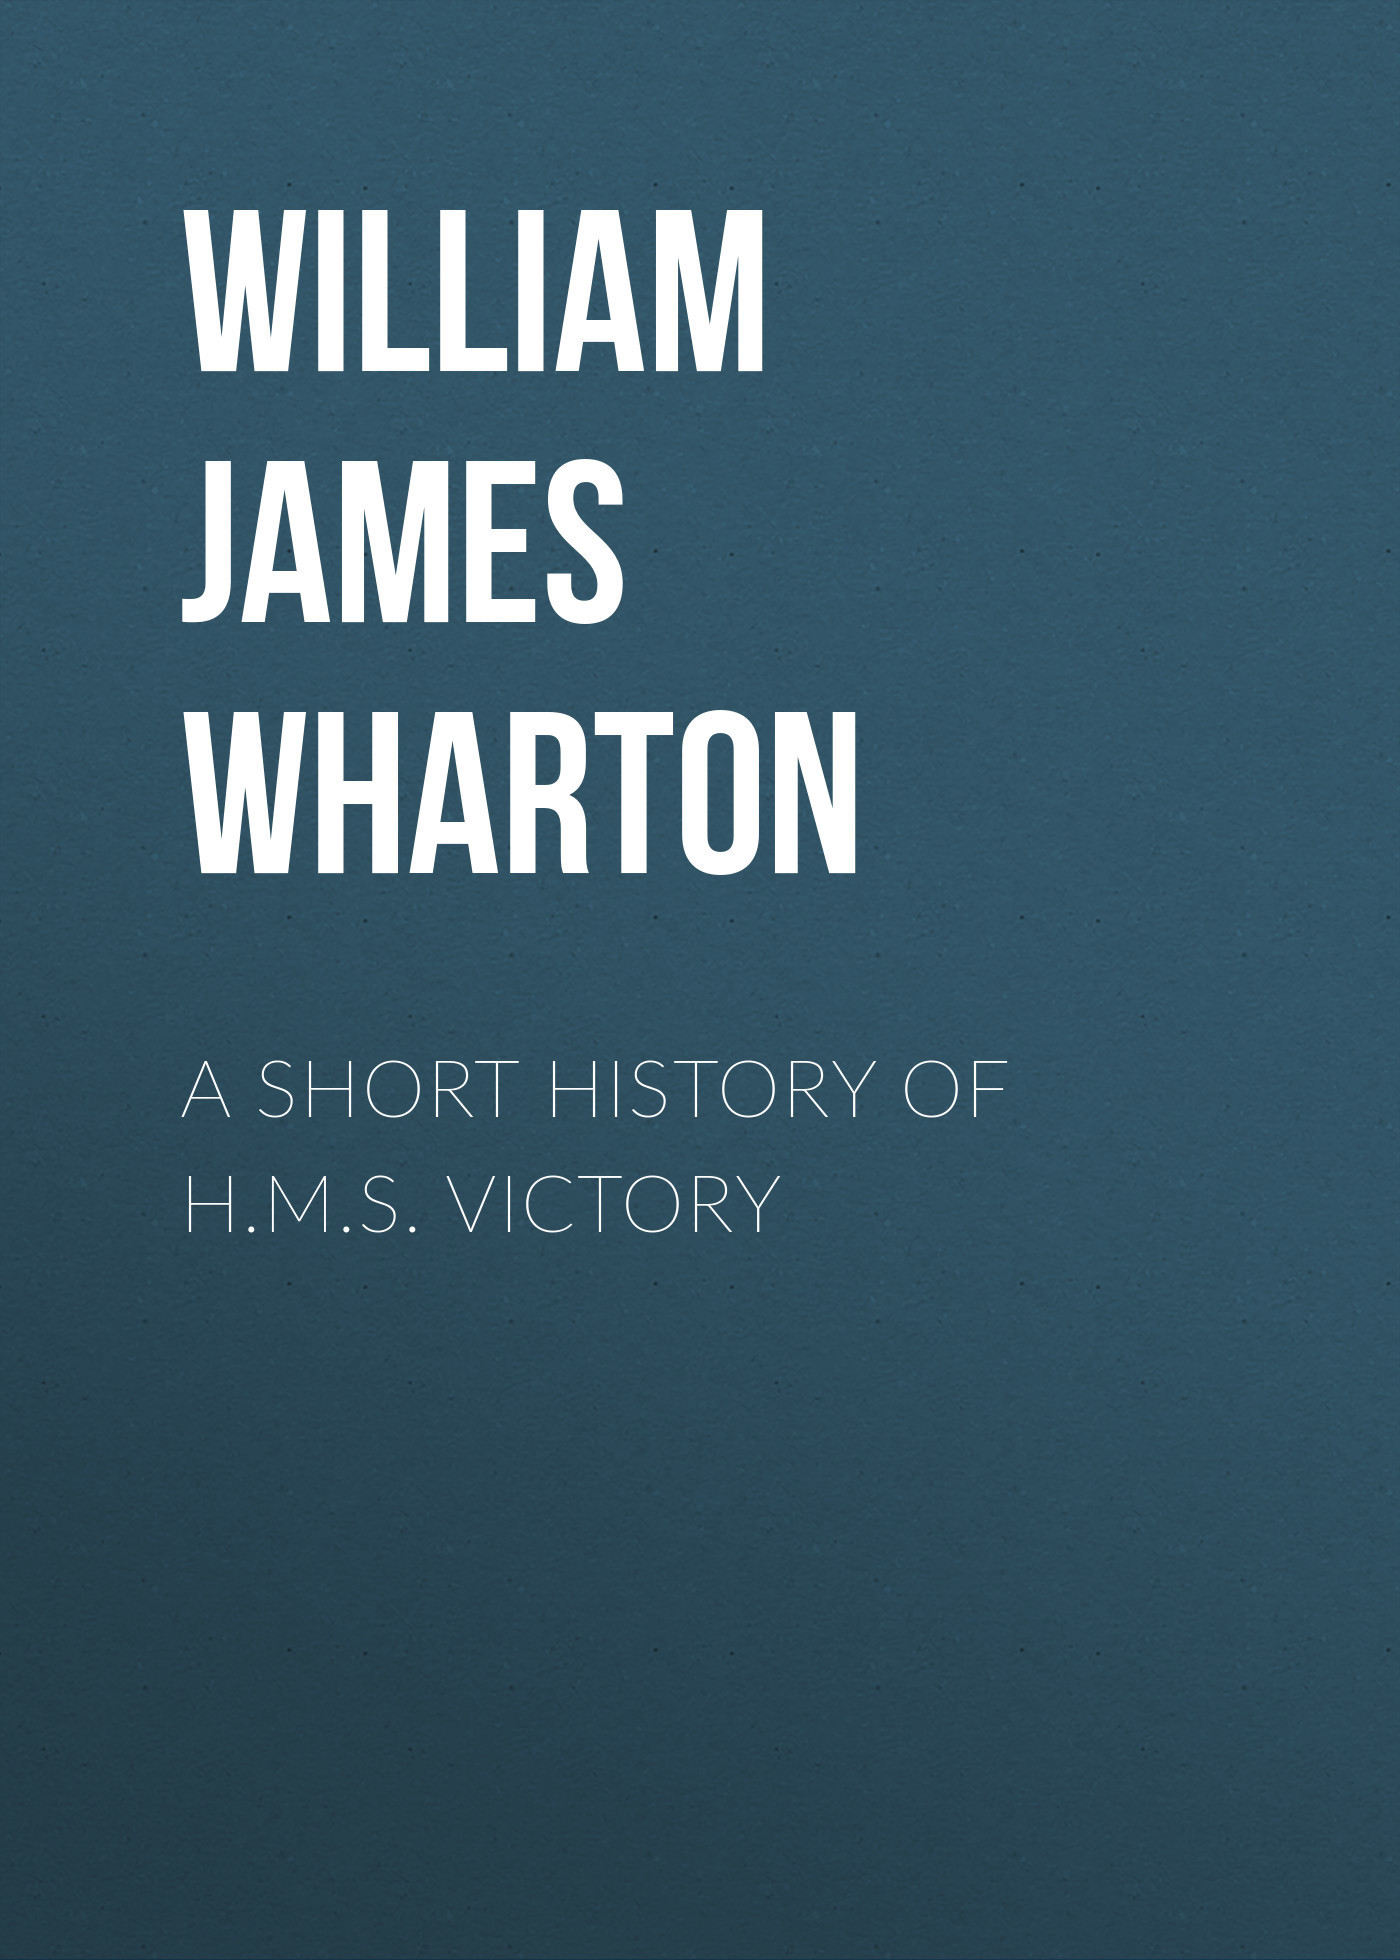 William James Lloyd Wharton A Short History of H.M.S. Victory kosovo a short history